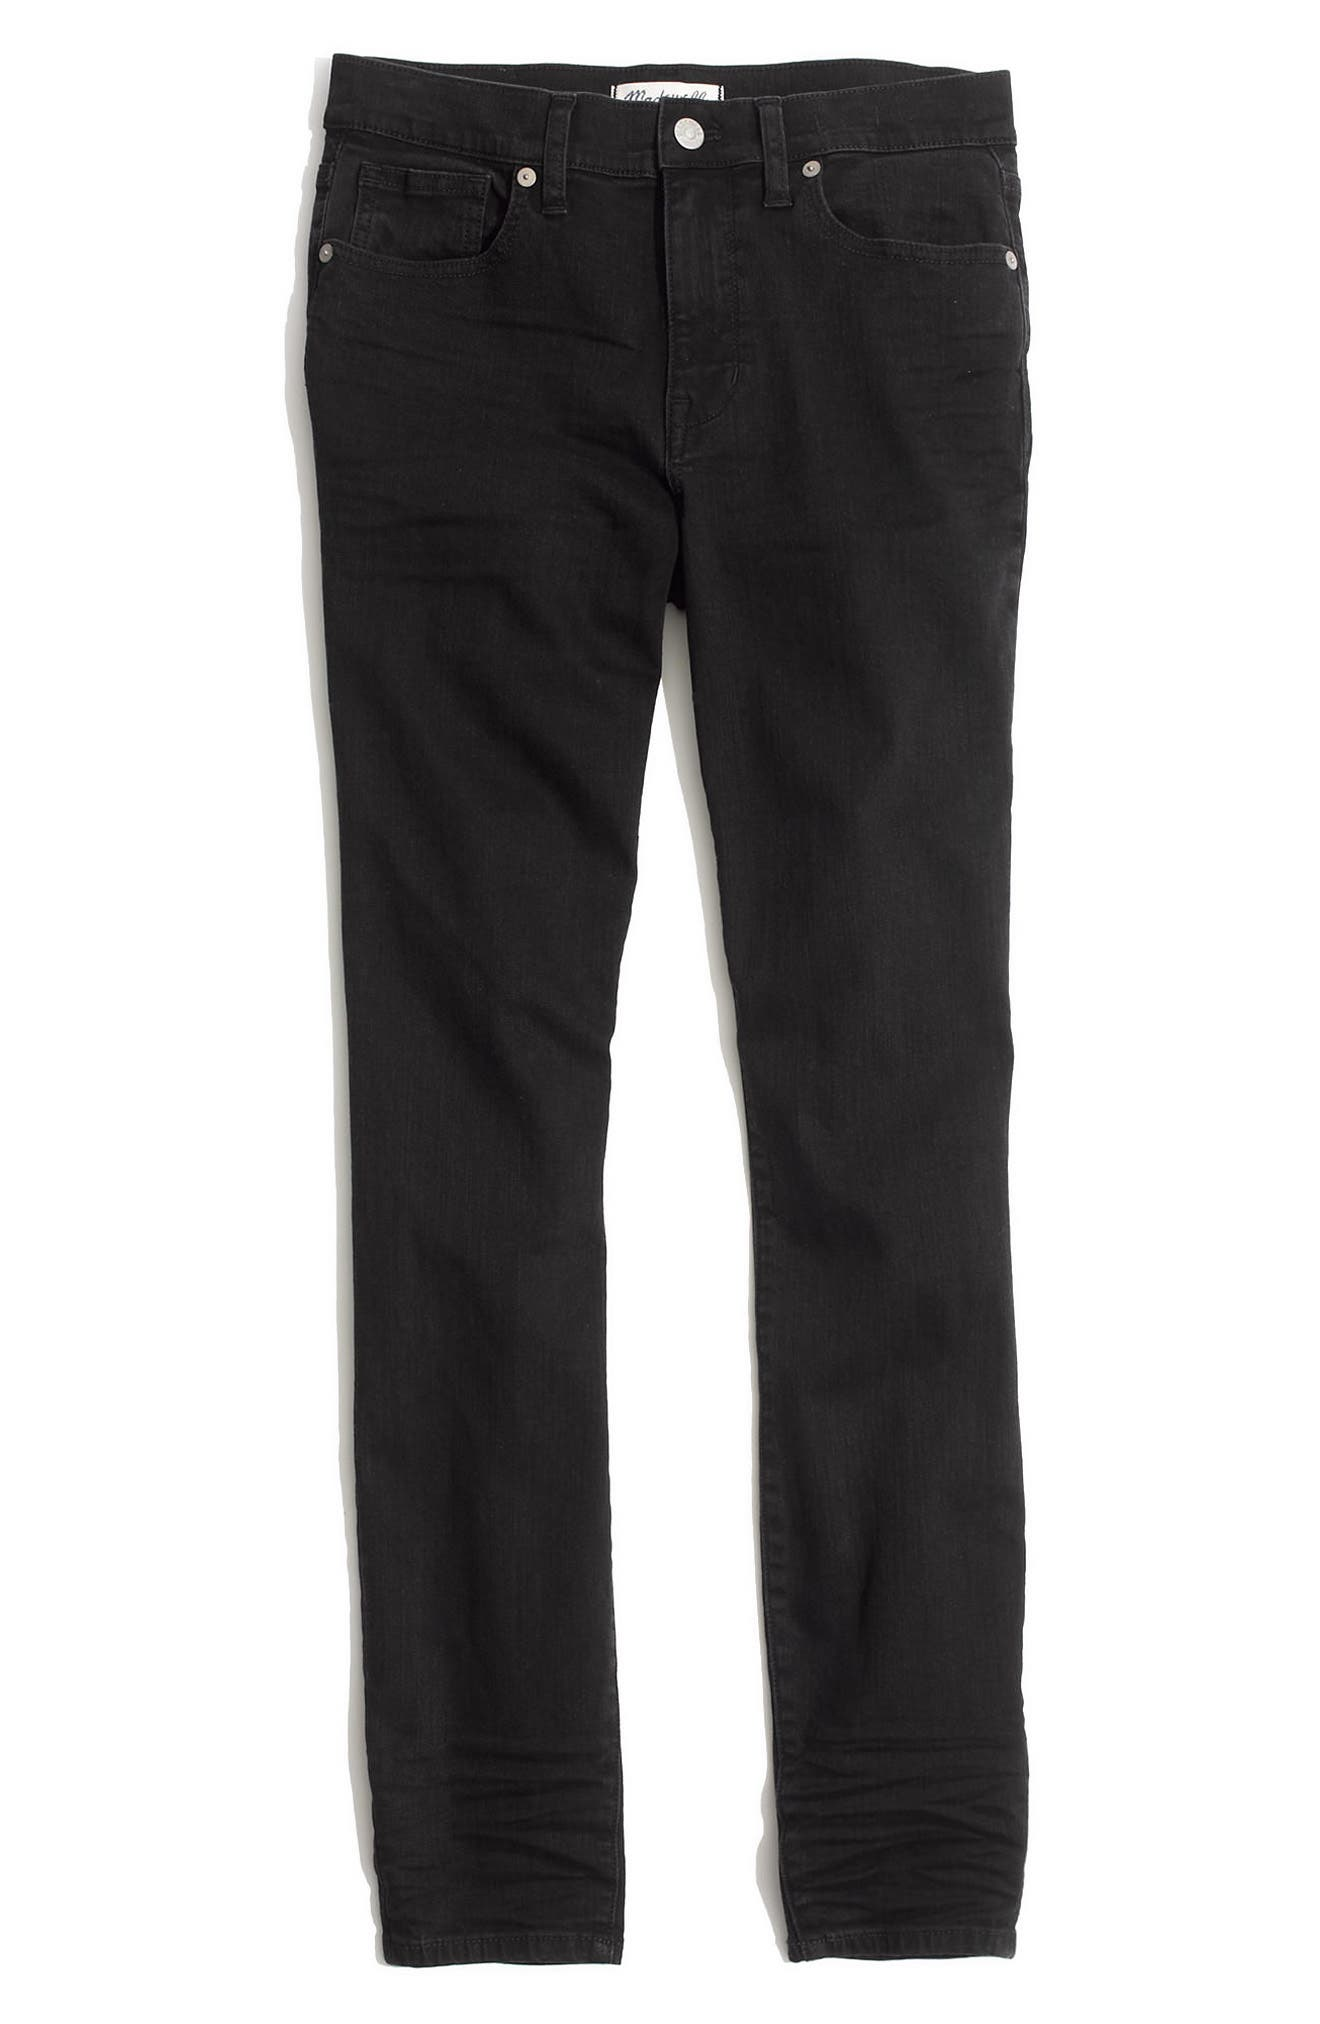 9-Inch High Rise Skinny Jeans,                             Alternate thumbnail 3, color,                             LUNAR